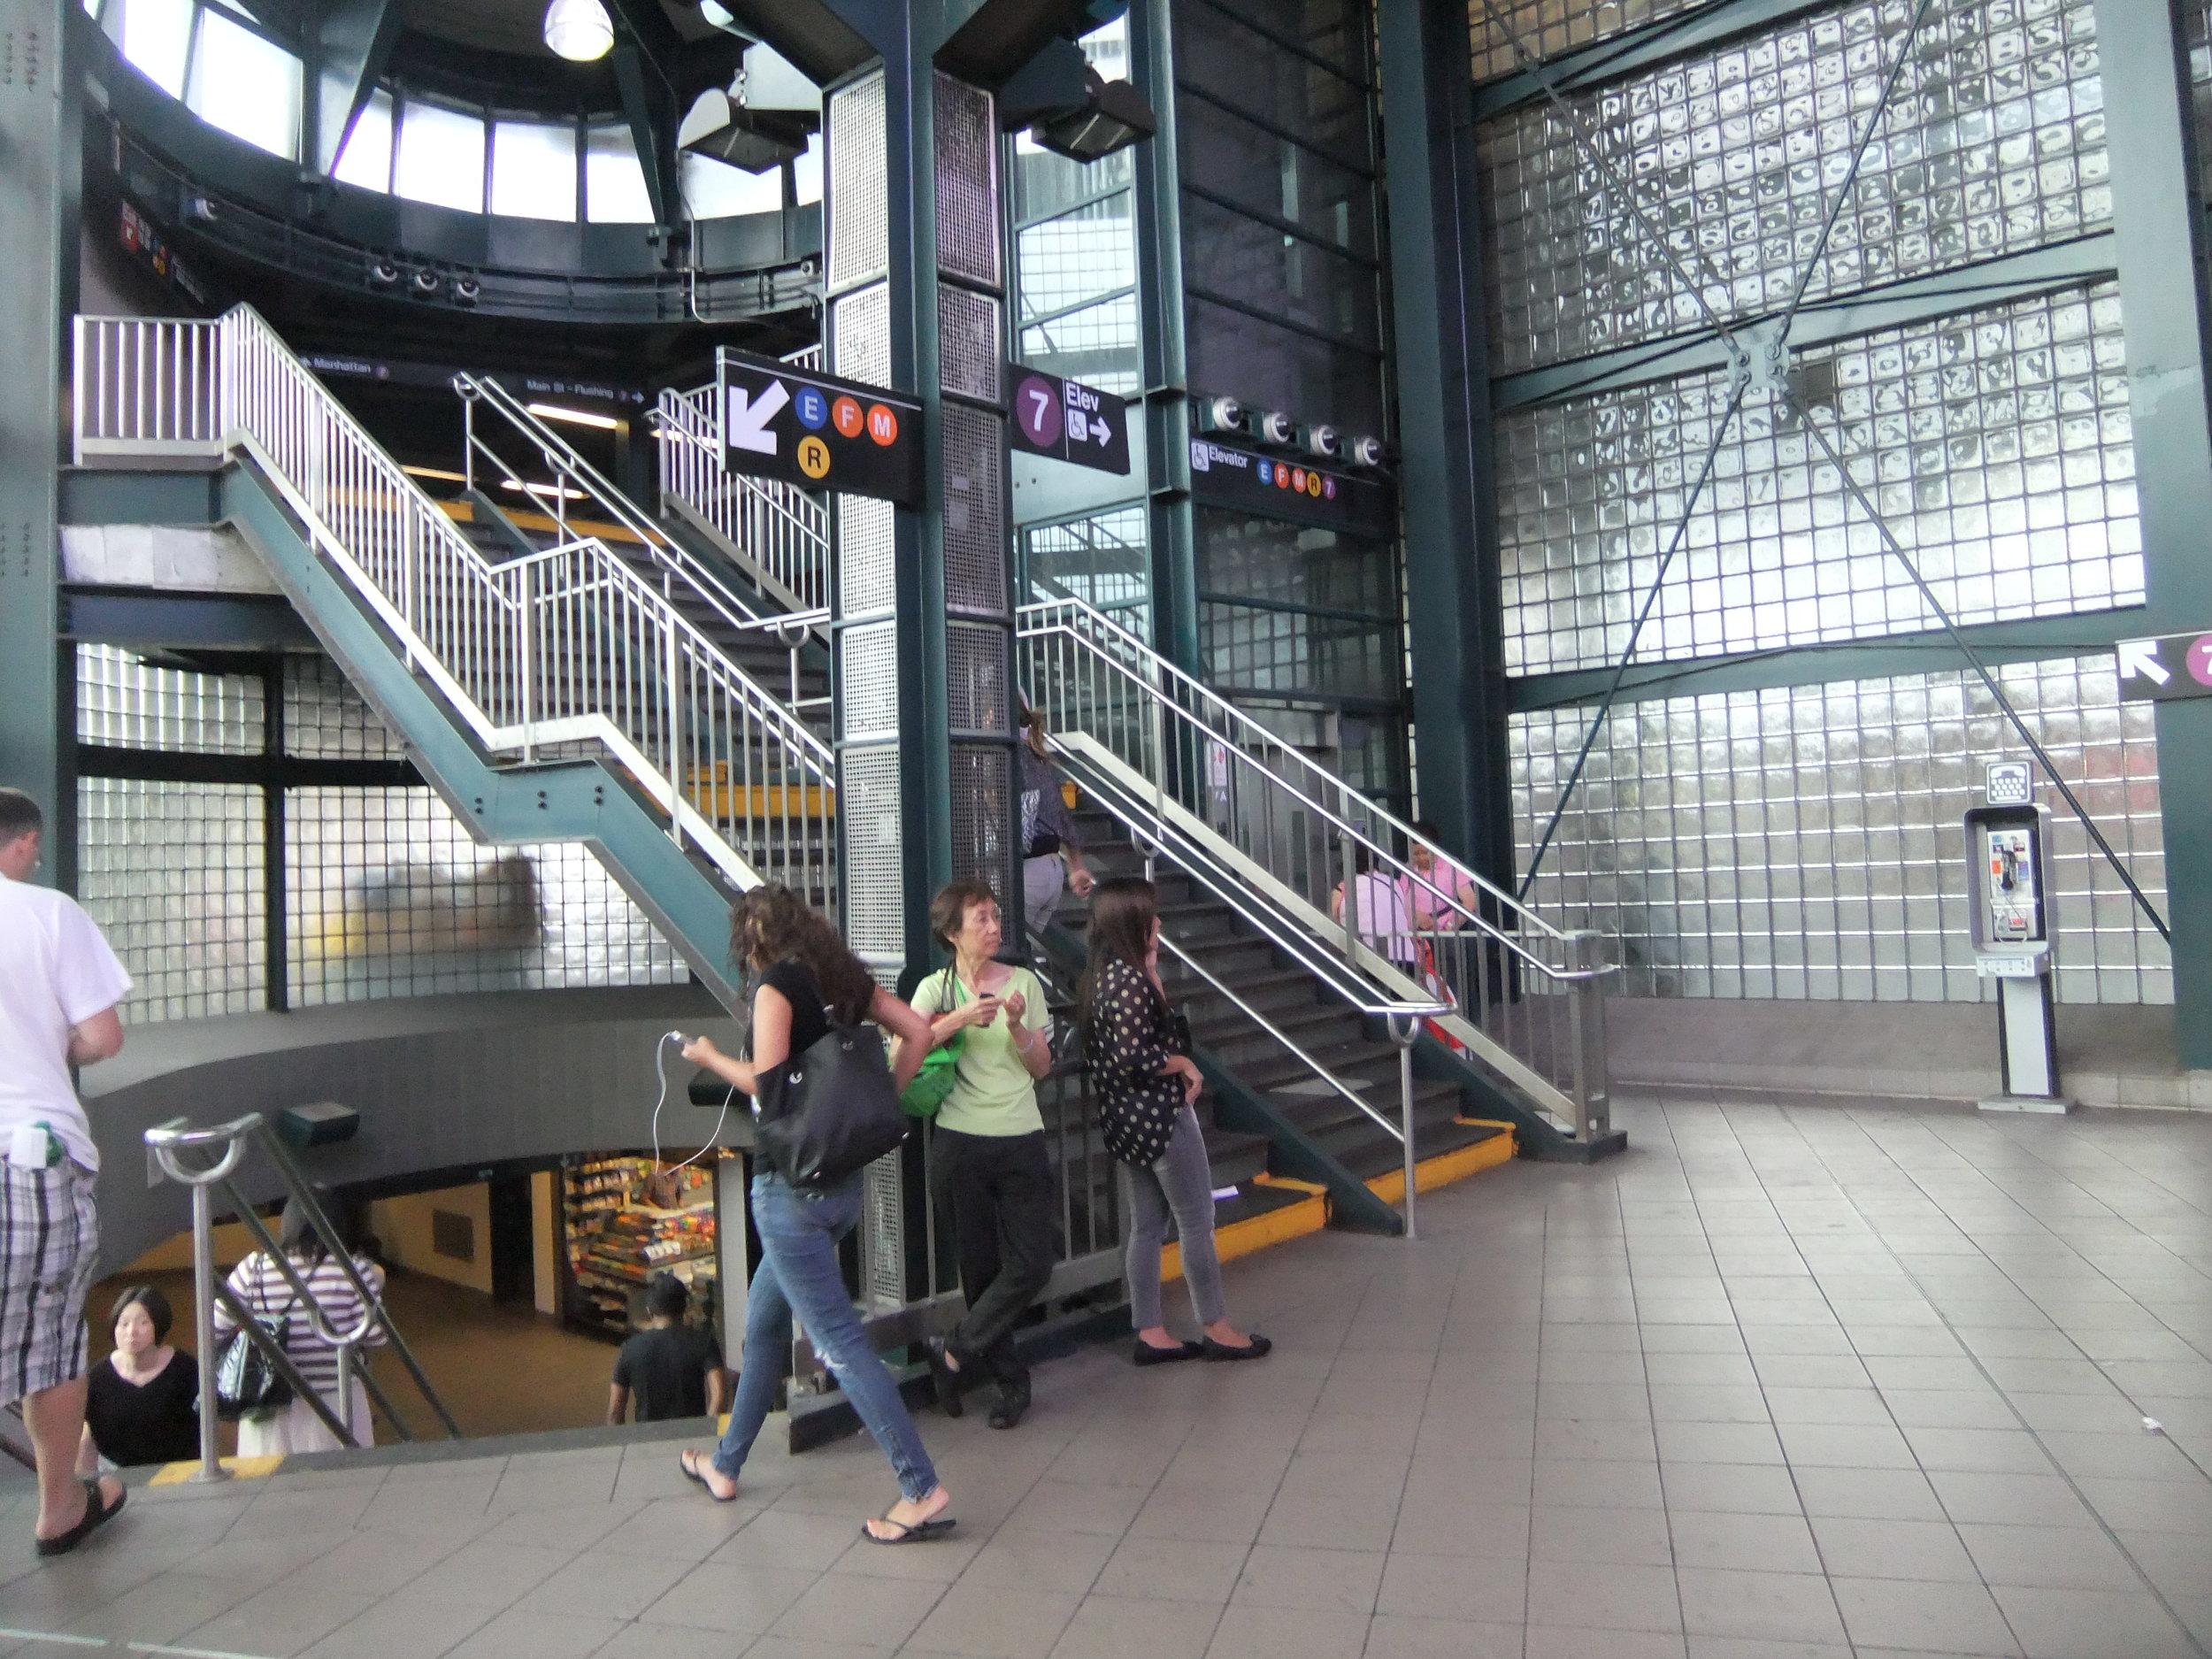 The Roosevelt Avenue-Jackson Heights subway station. Harrison Leong via Wikimedia Commons.